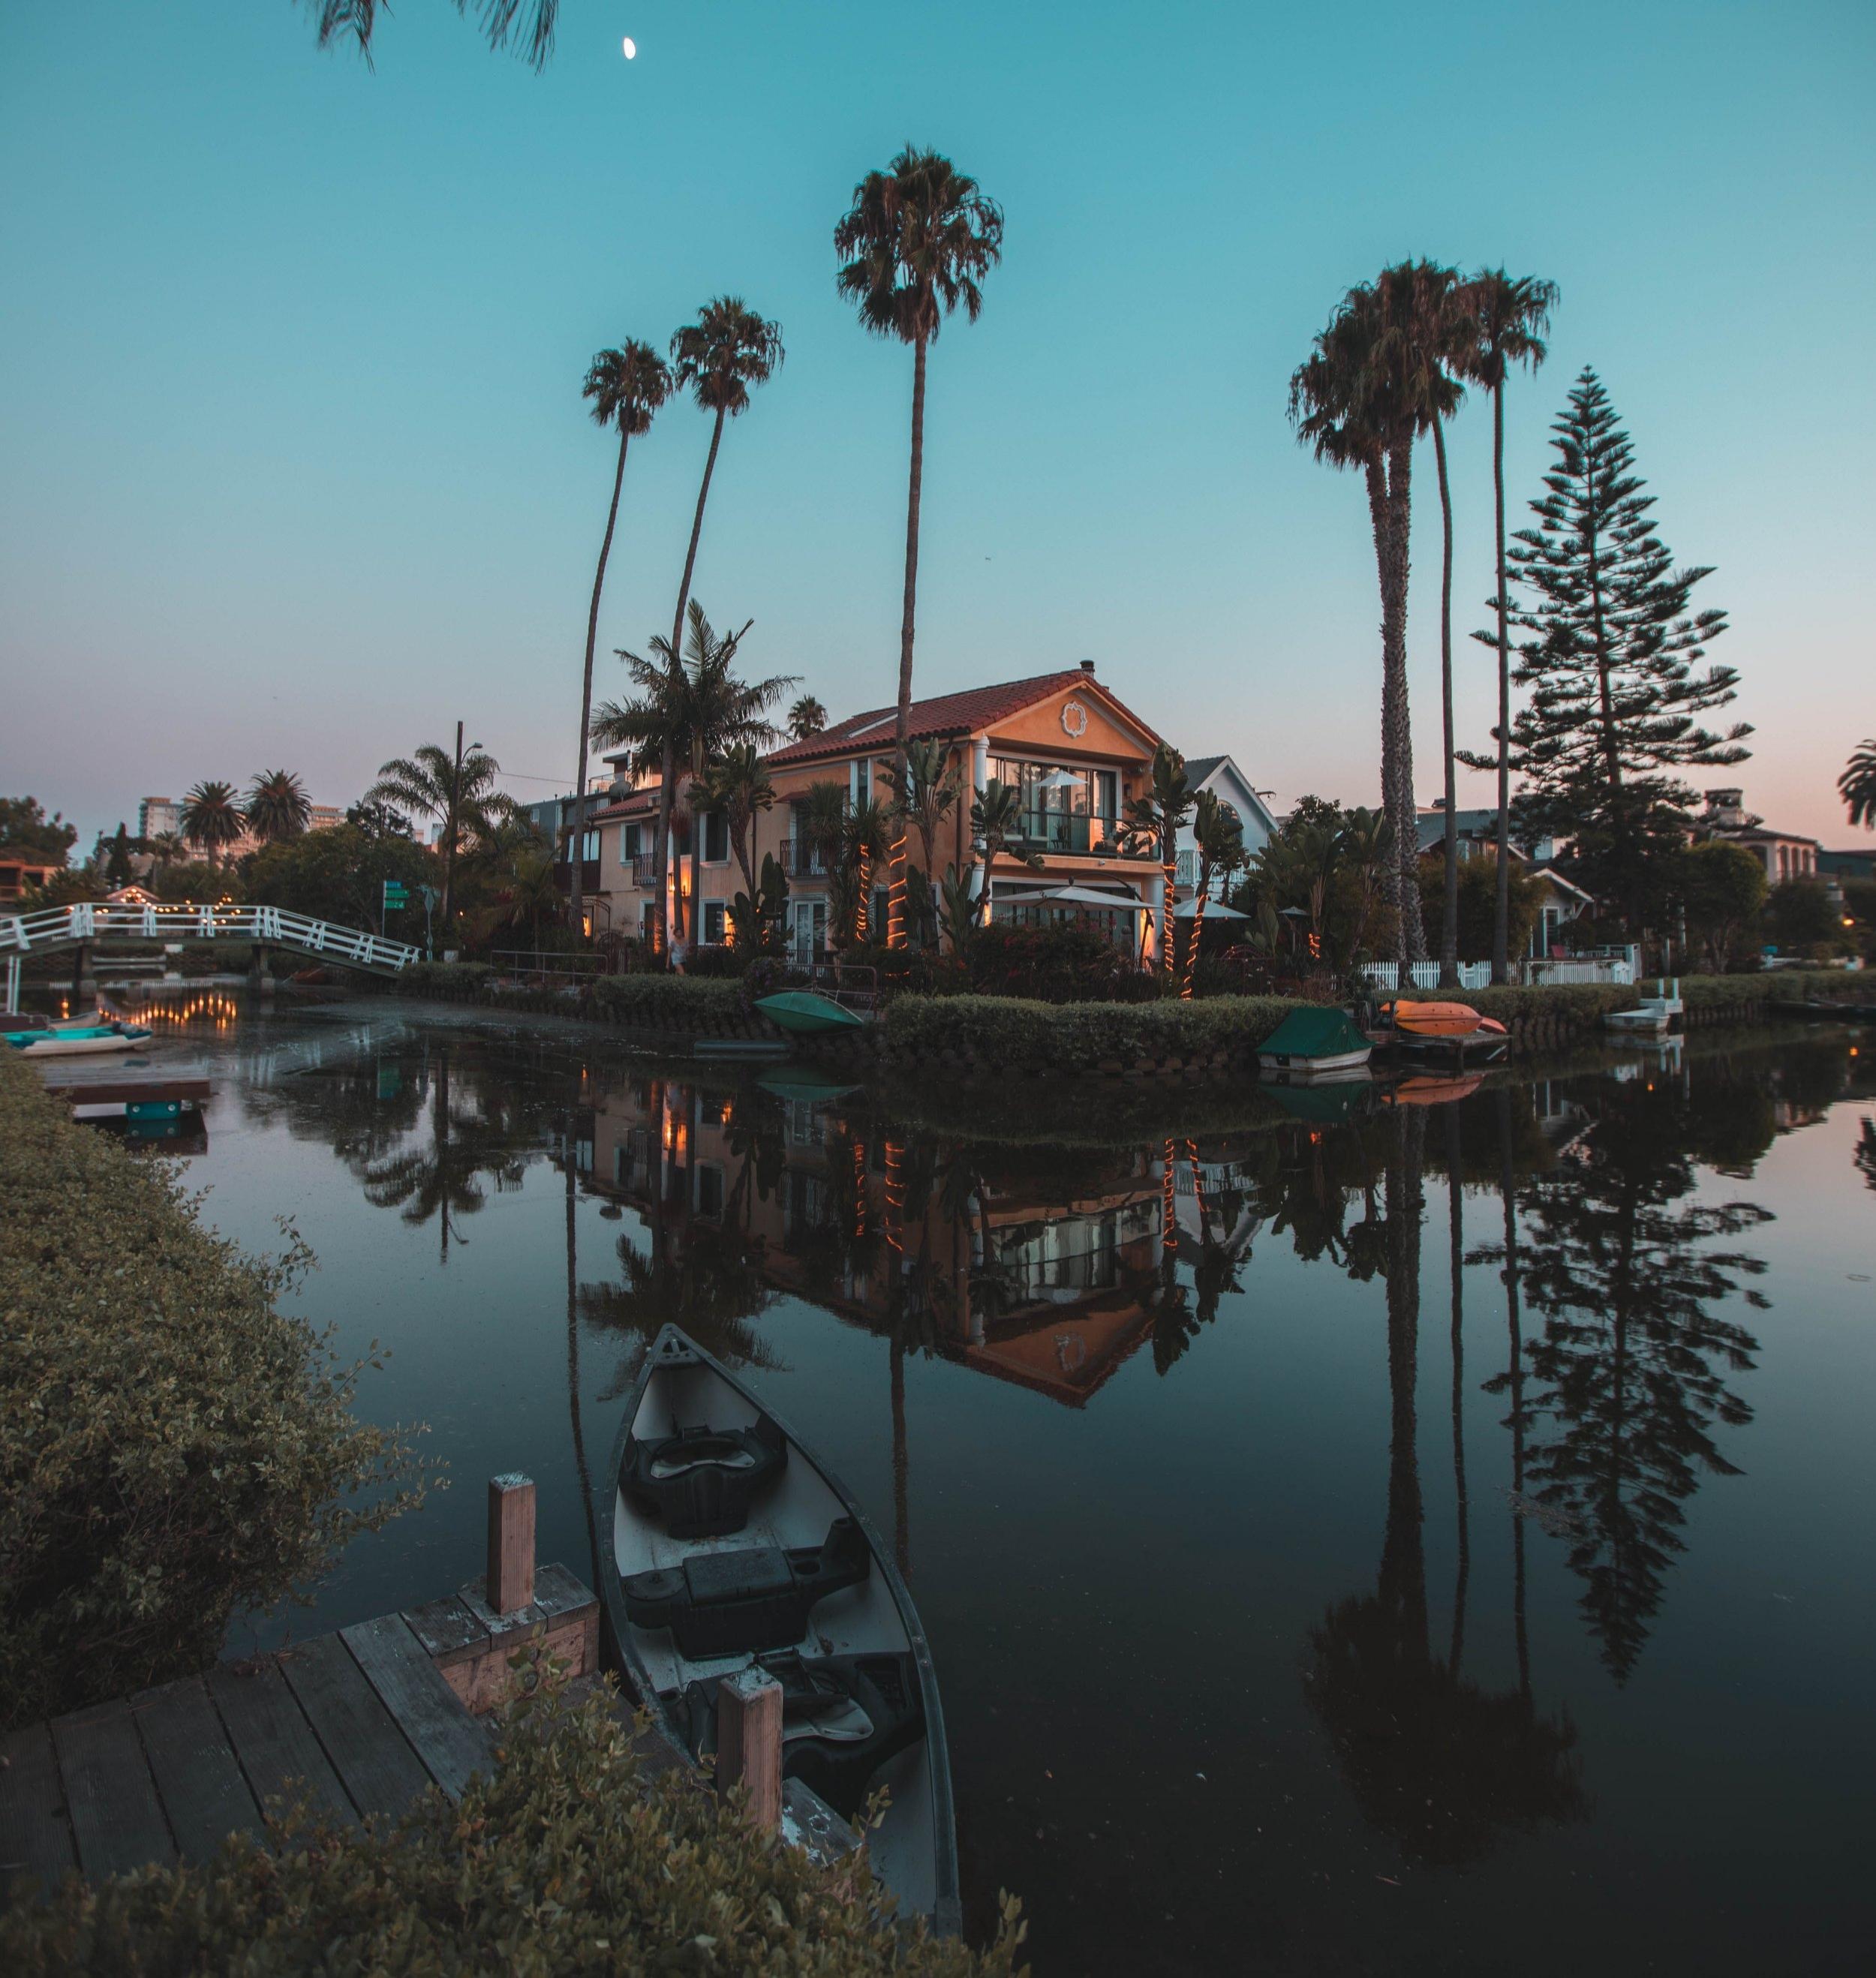 Venice Canals, Venice CA. // Photo:  @rpnickson